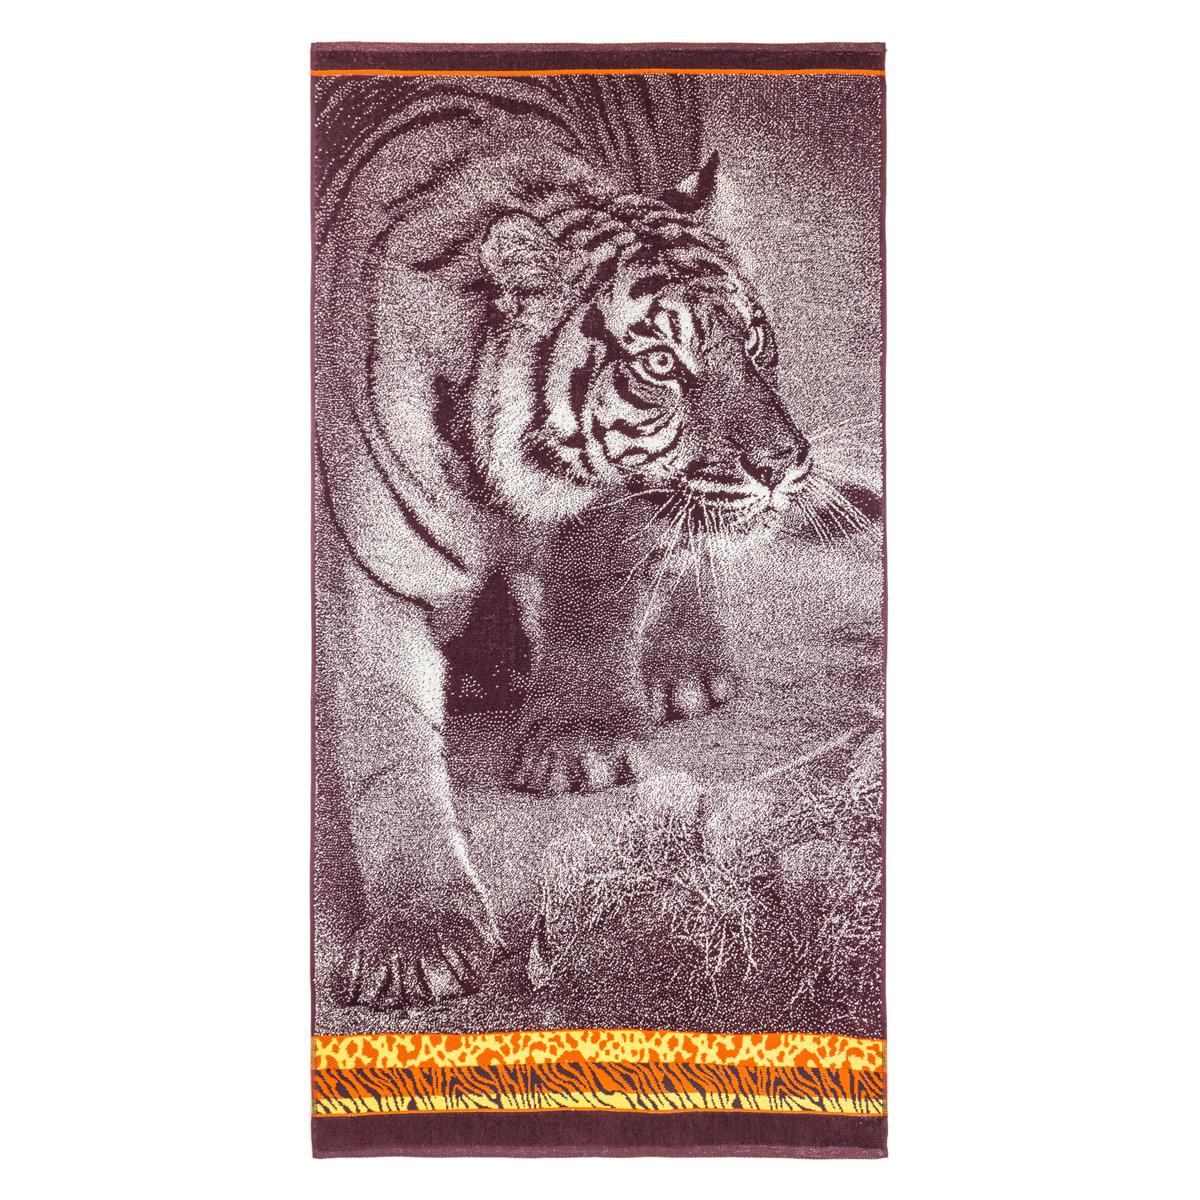 Полотенце Тигр Коричневый р. 70х140Махровые полотенца<br>Плотность ткани:420 г/кв. М<br><br>Тип: Полотенце<br>Размер: 70х140<br>Материал: Махра